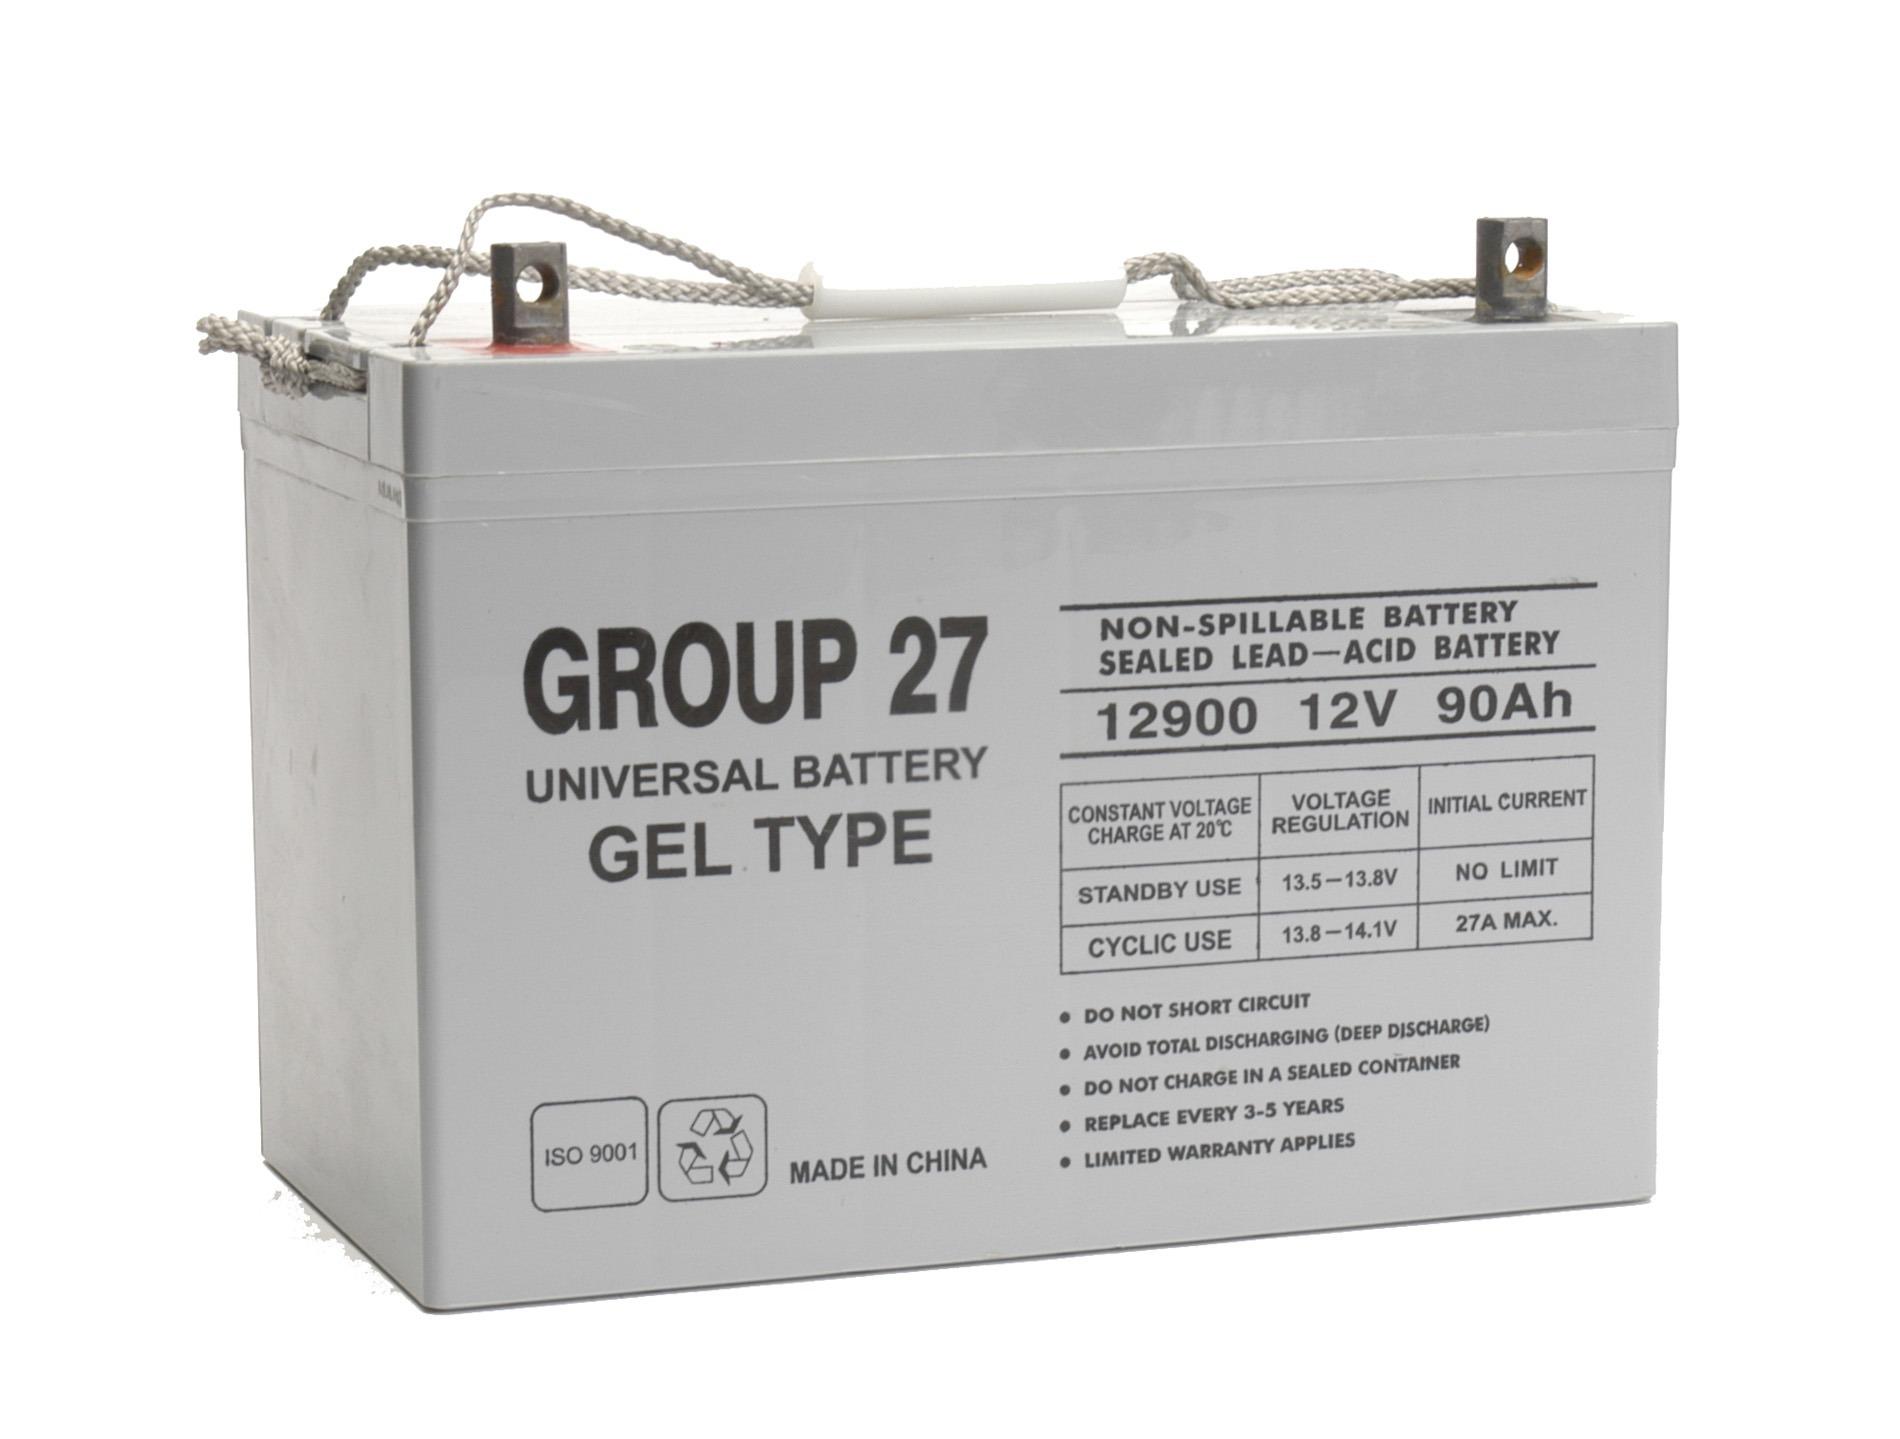 UB12900 (Group 27) 12v 90ah GEL Type Battery